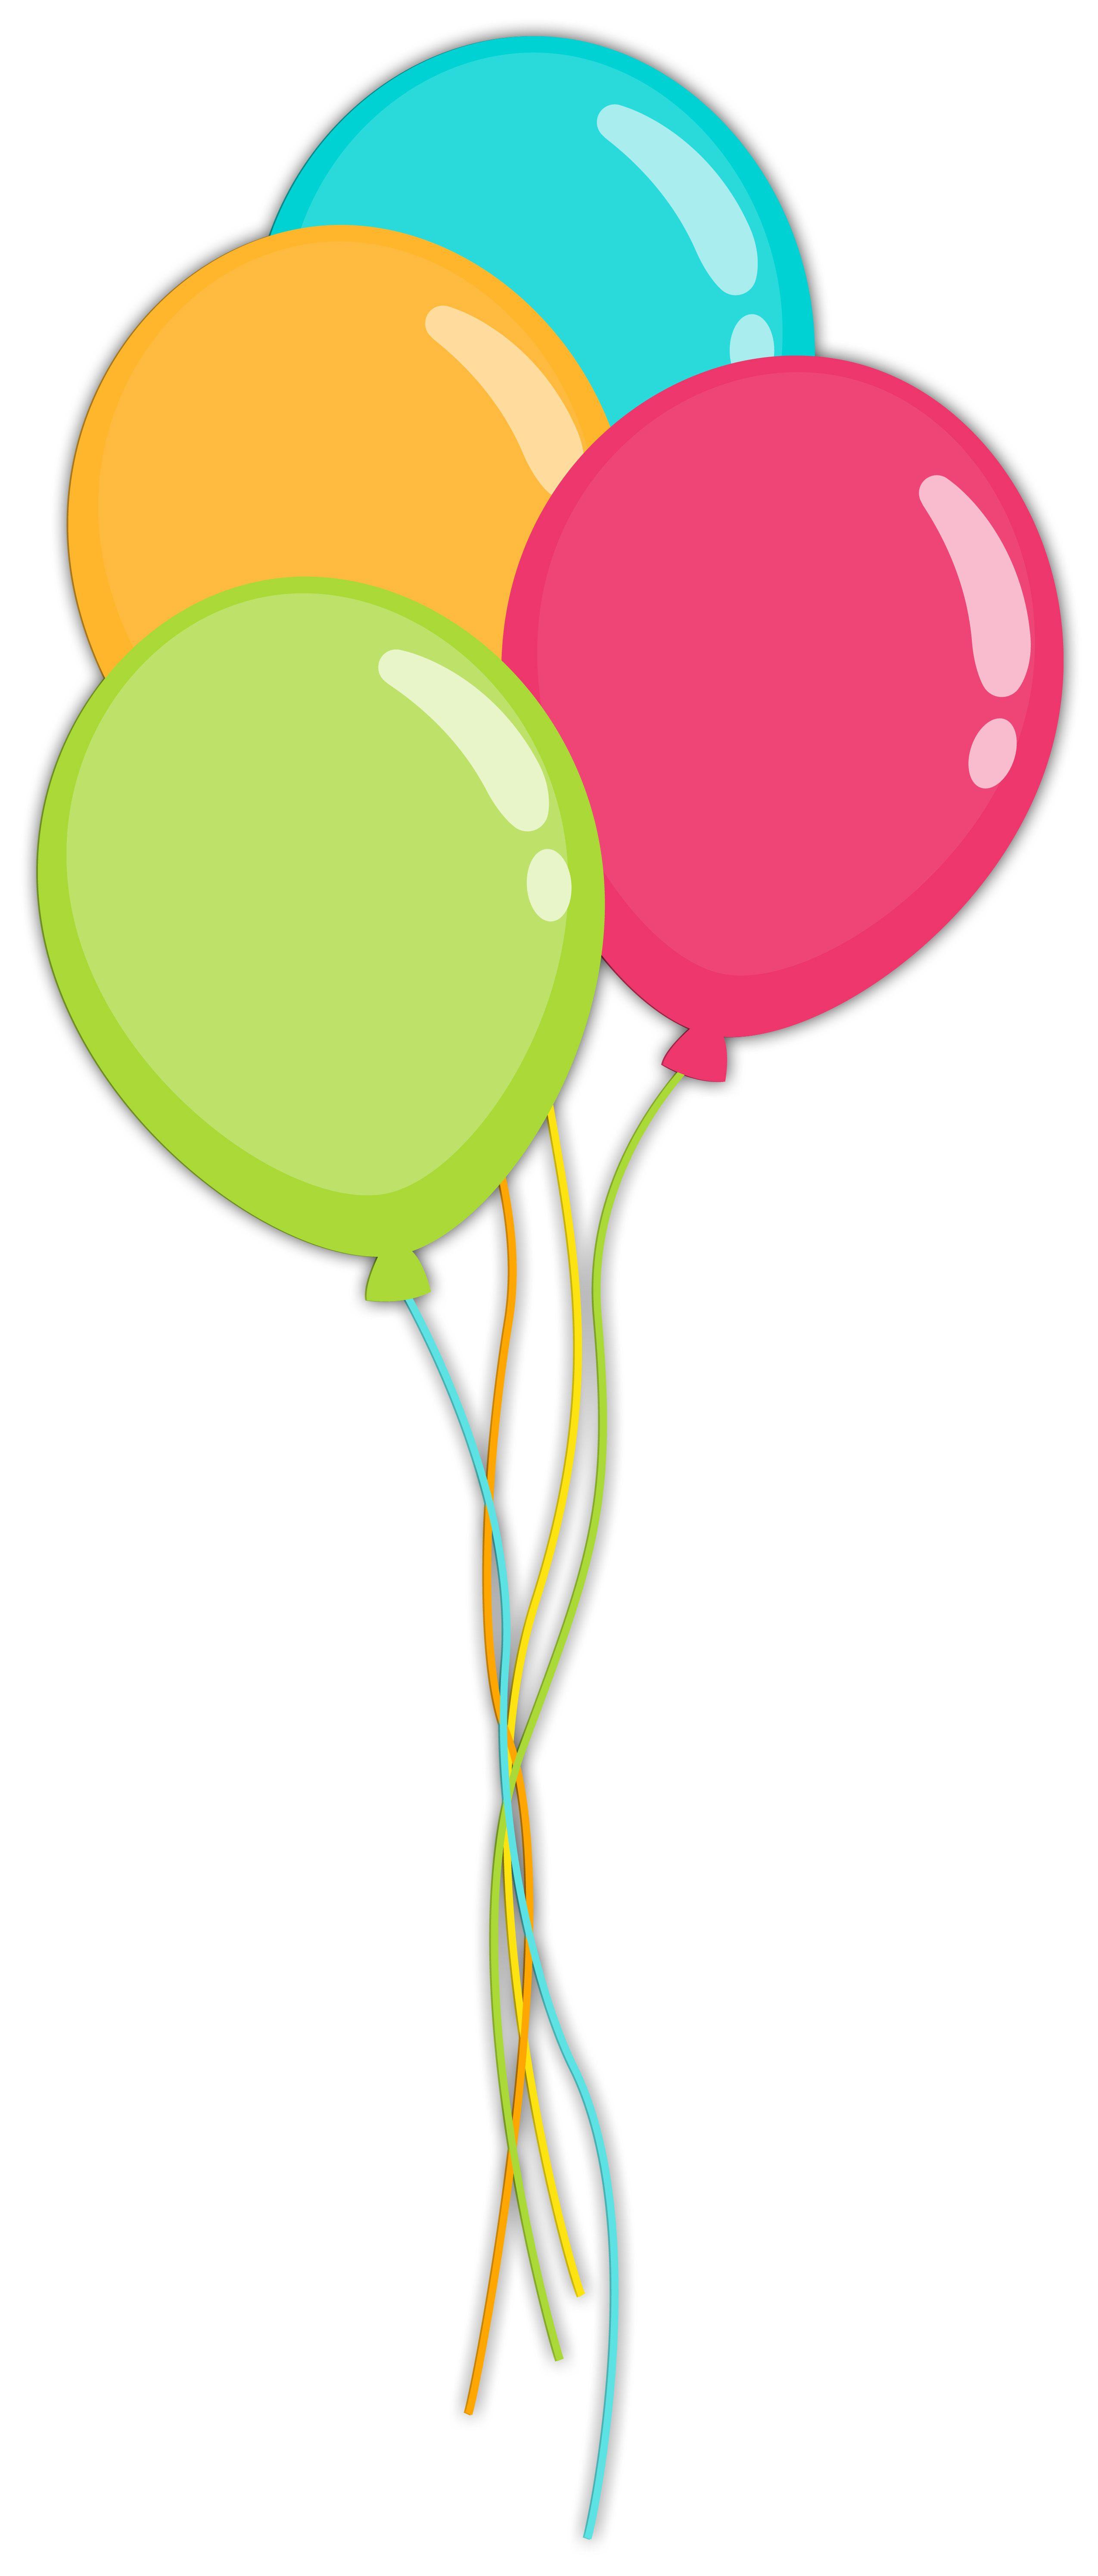 Balloons clip art pinterest. Balloon clipart party balloon